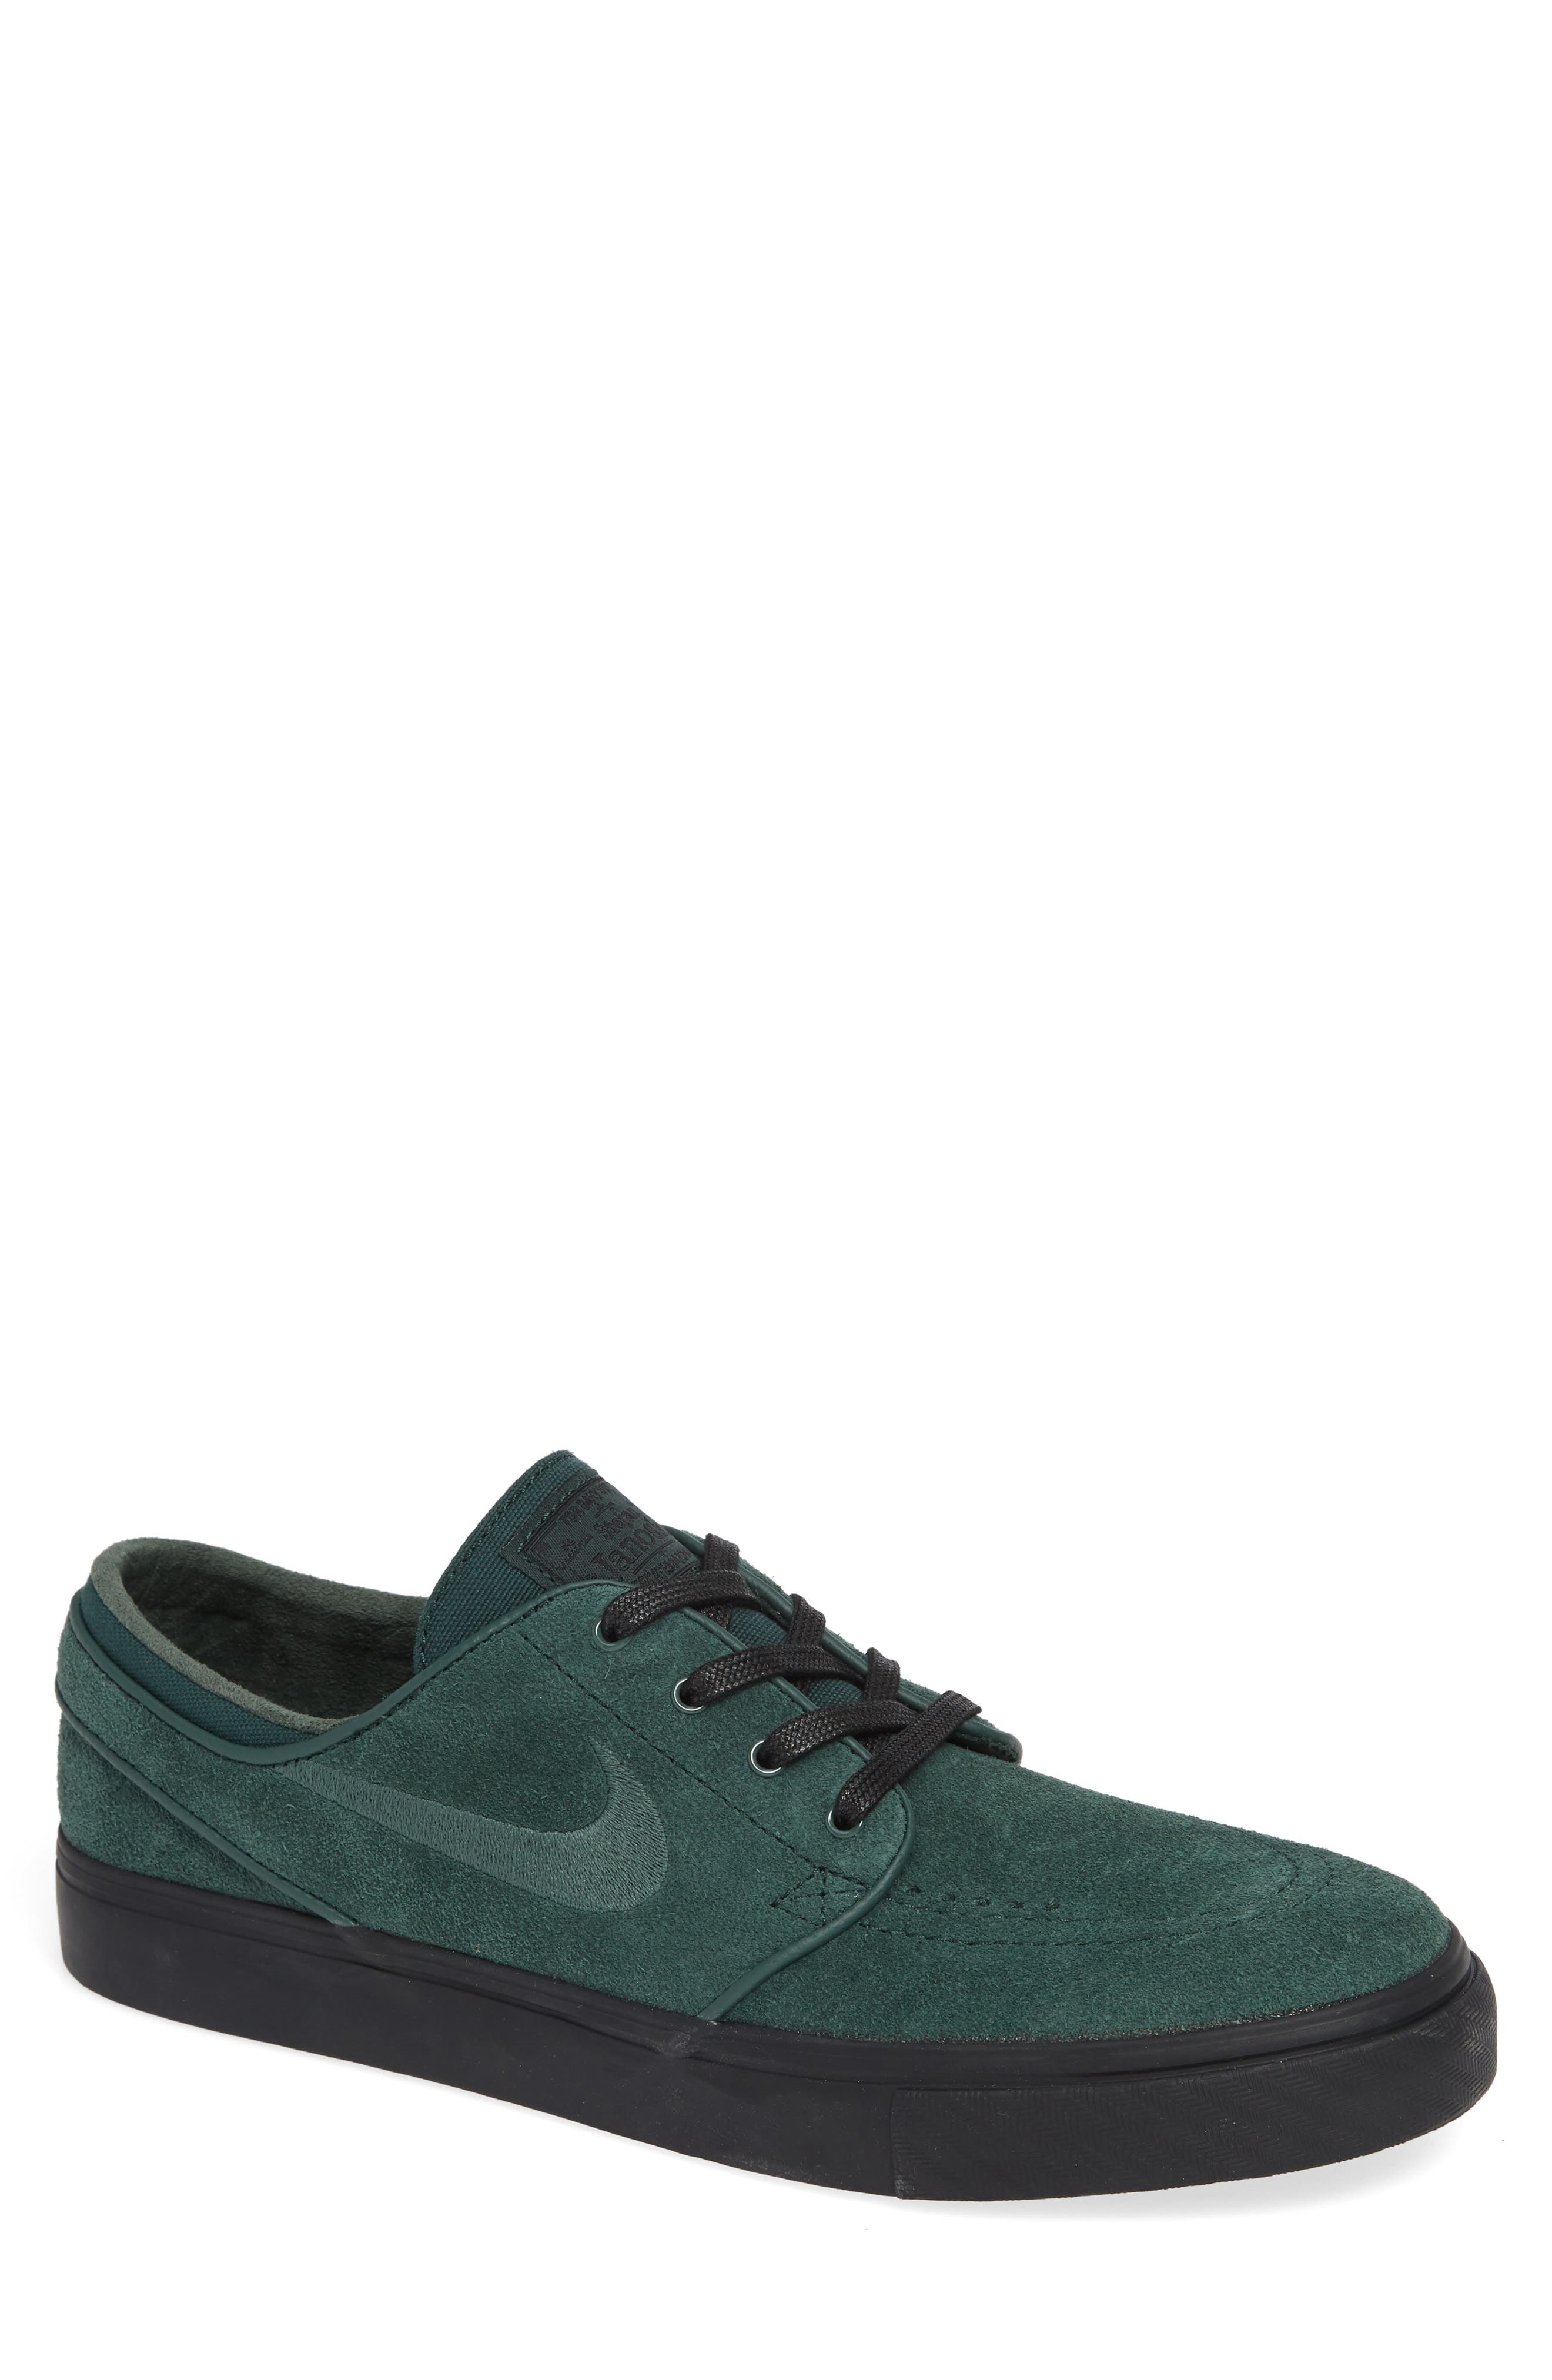 'Zoom - Stefan Janoski' Skate Shoe,                         Main,                         color, Midnight Green/ Black